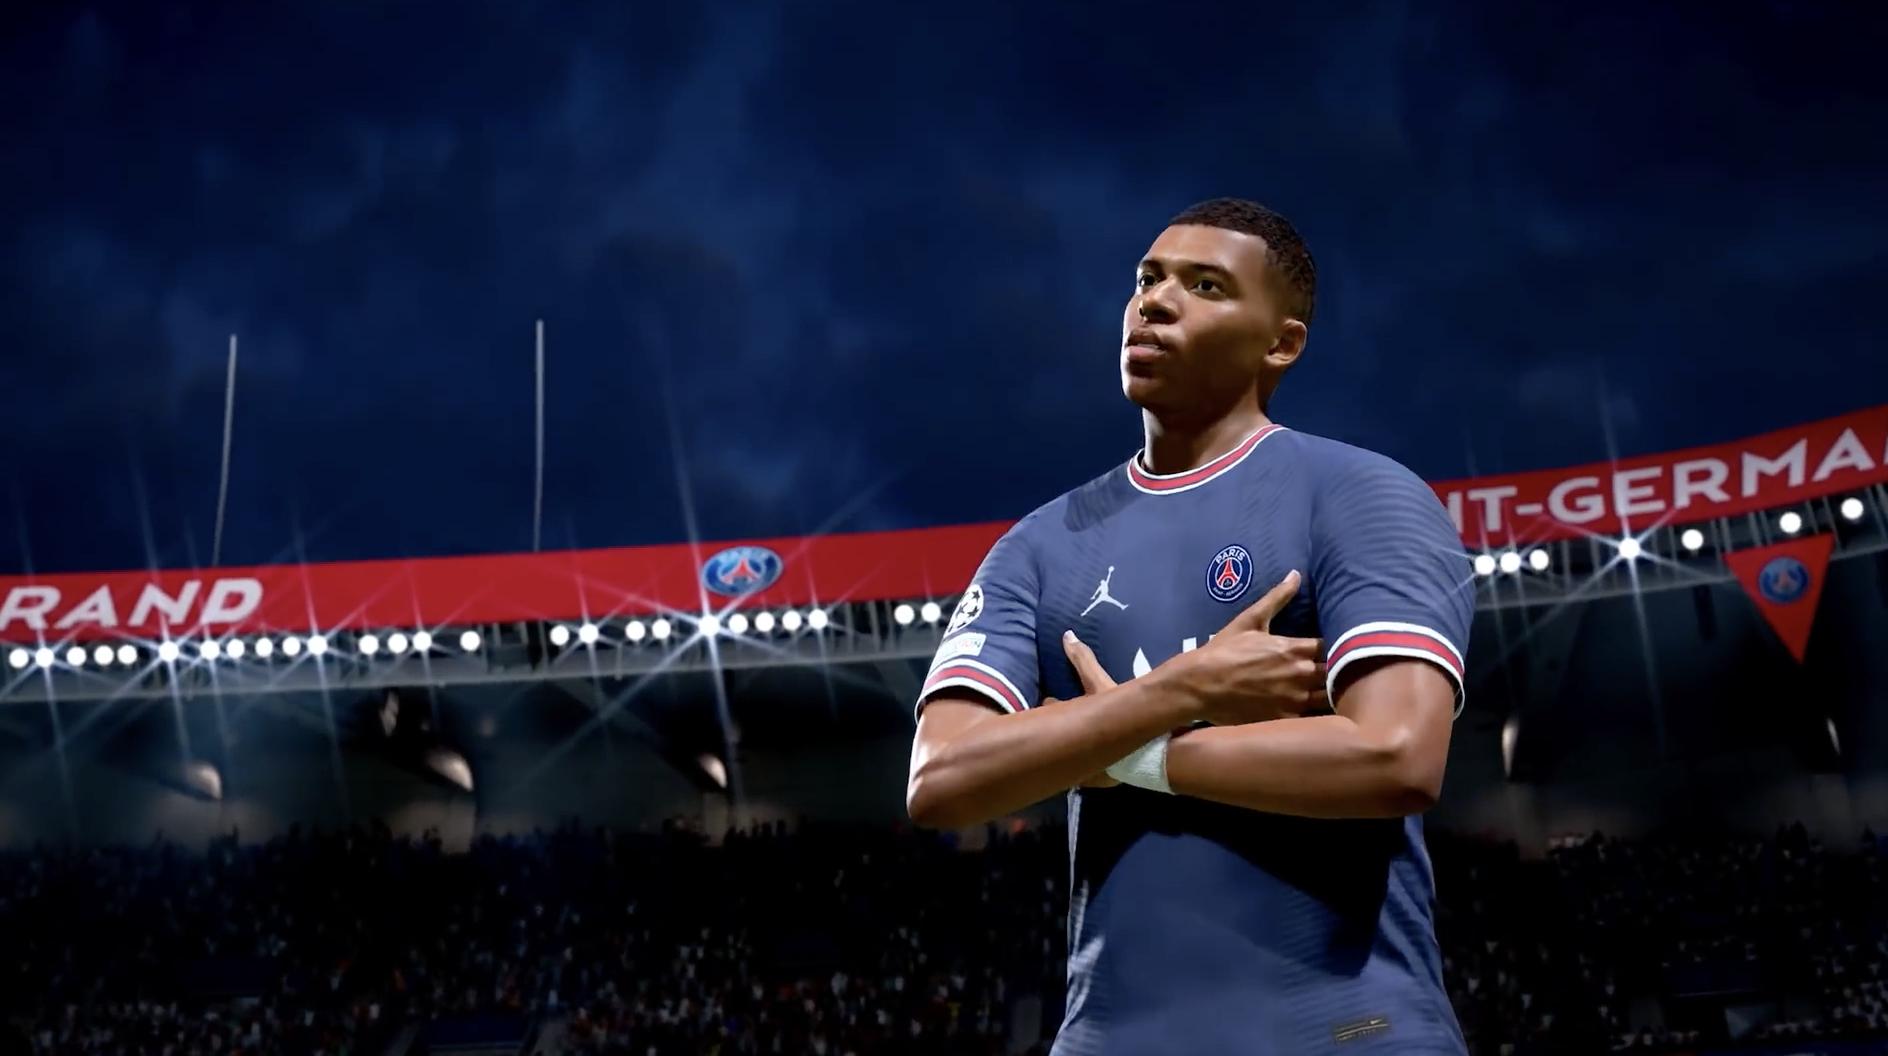 fifa 22 gameplay improvements